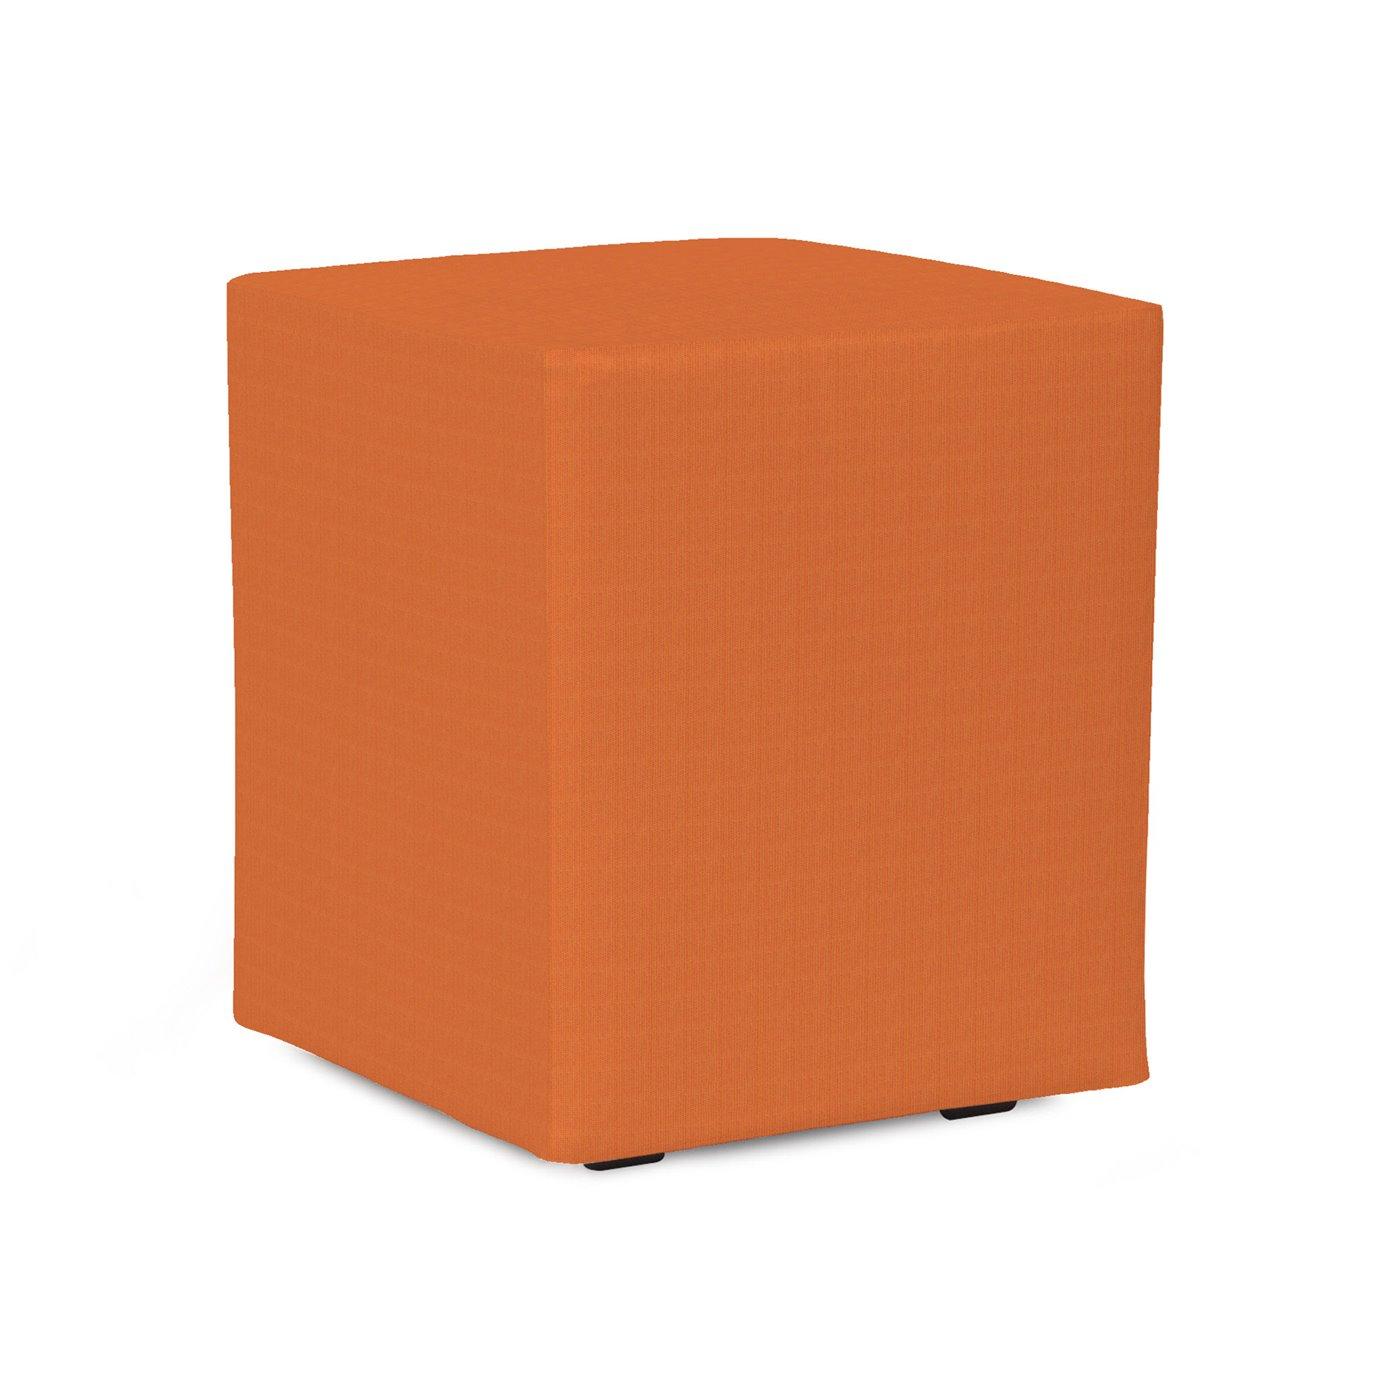 Howard Elliott Universal Cube Outdoor Sunbrella Seascape Canyon Complete Ottoman